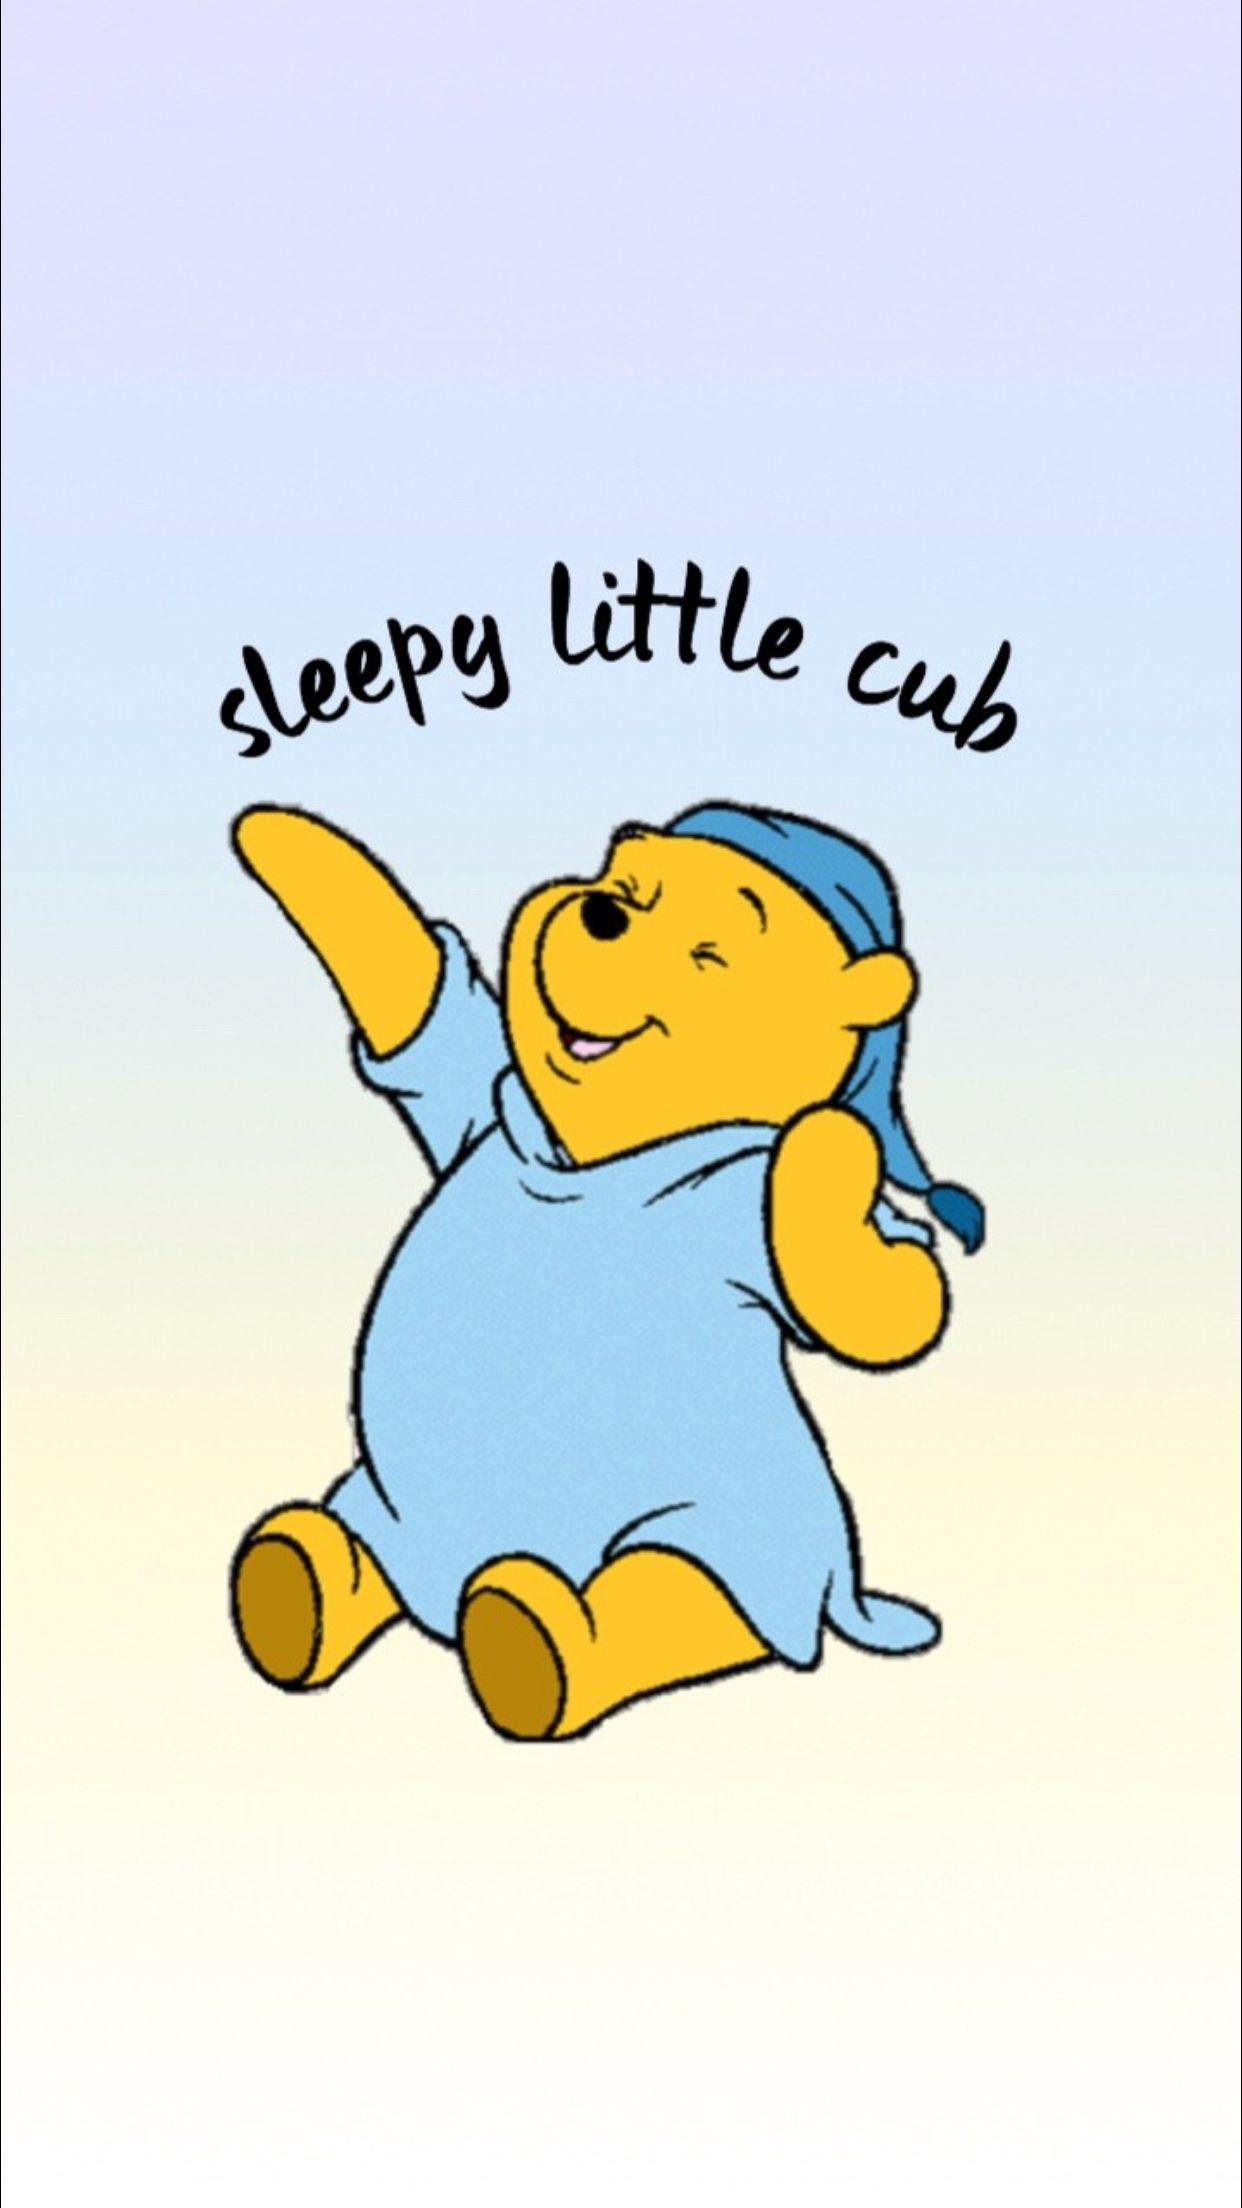 Pooh Bear.